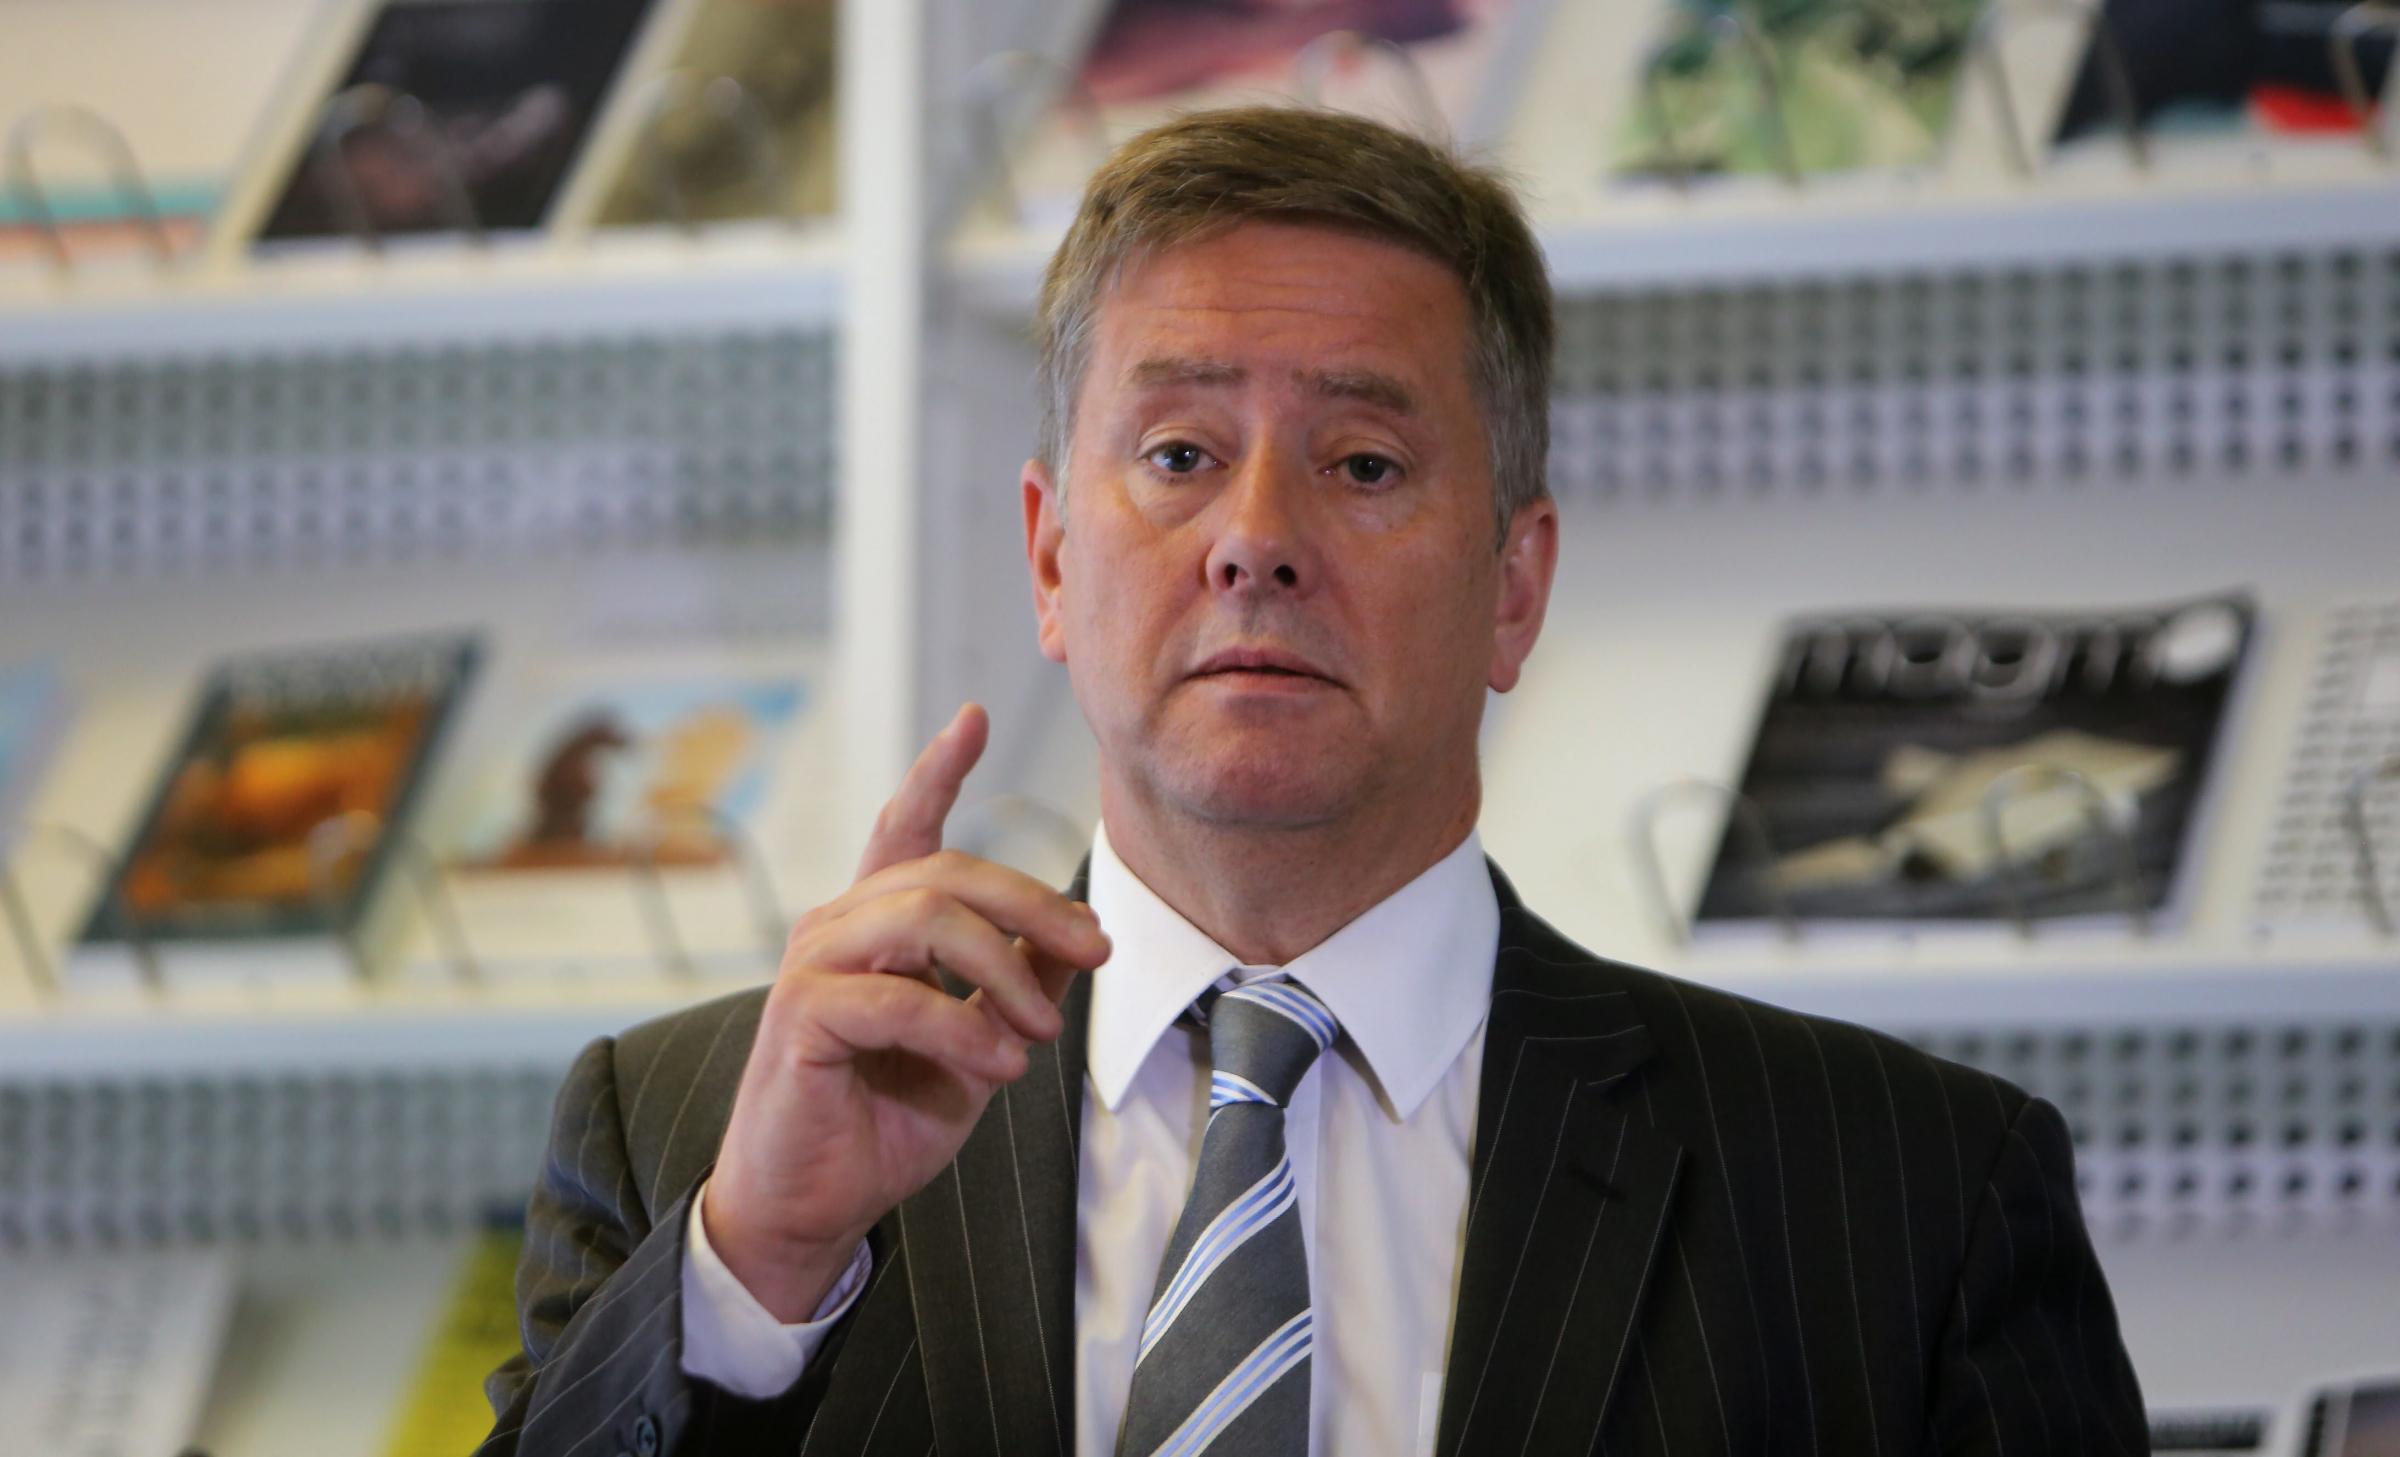 SNP slam 'desperate' bid to stop Scottish independence amid Covid crisis